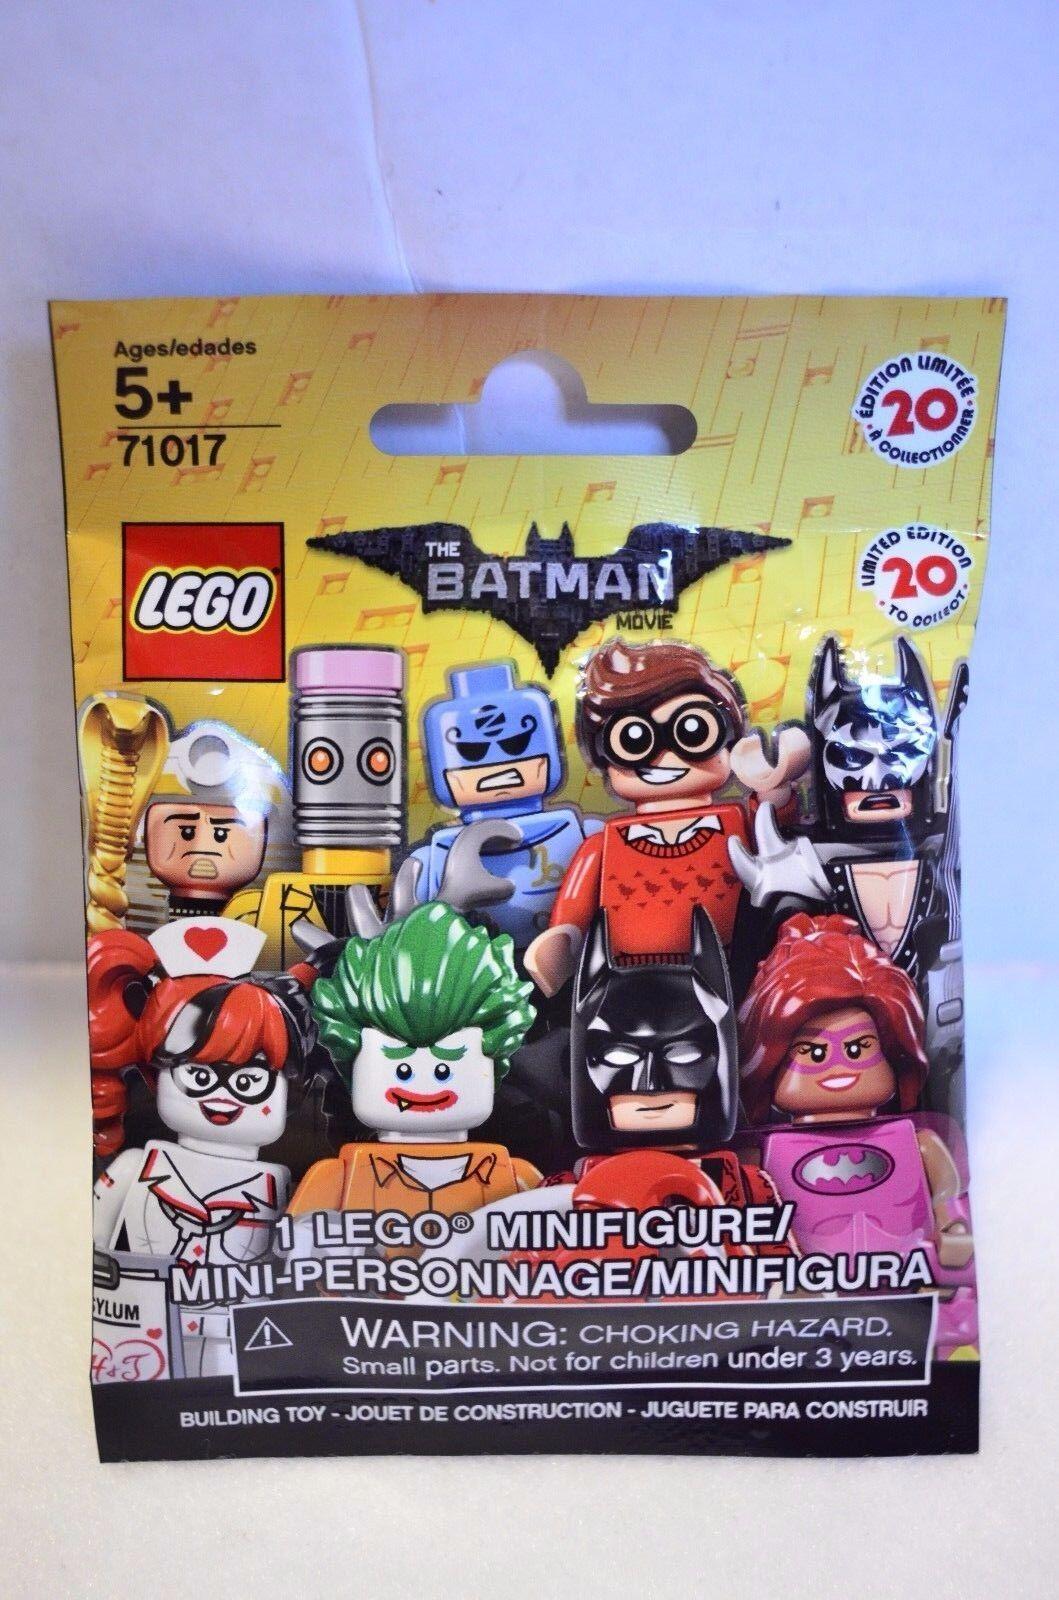 Lego The Batman Movie Series Barbara Gordon Minifigure 71017 Ebay Minifigures Box Of 60 Norton Secured Powered By Verisign